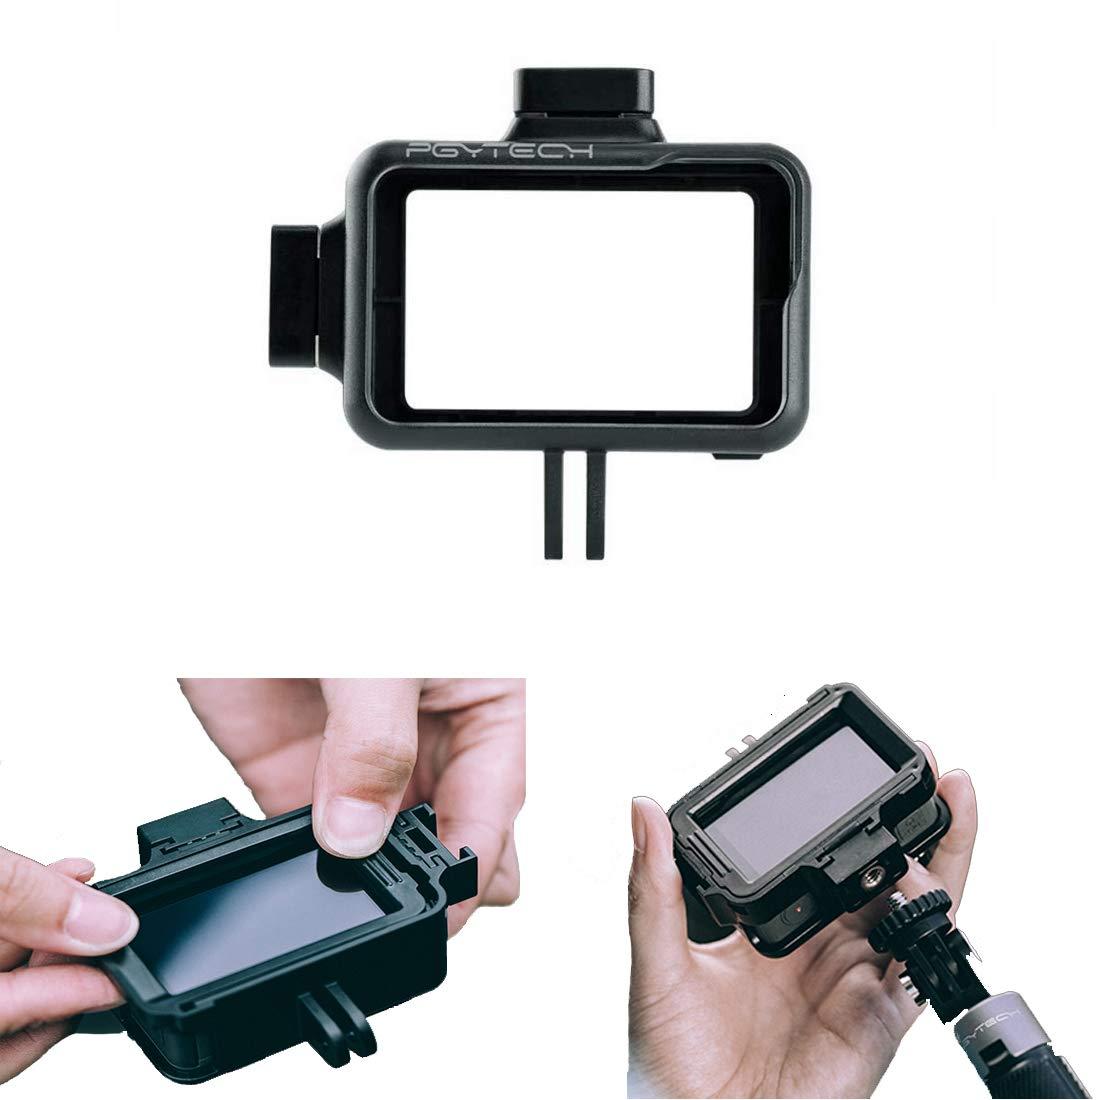 PGYTECHアクションカメラケージ DJI OSMOアクション用カメラ保護ハウジングフレームケースユニバーサルインターフェース拡張アクセサリー